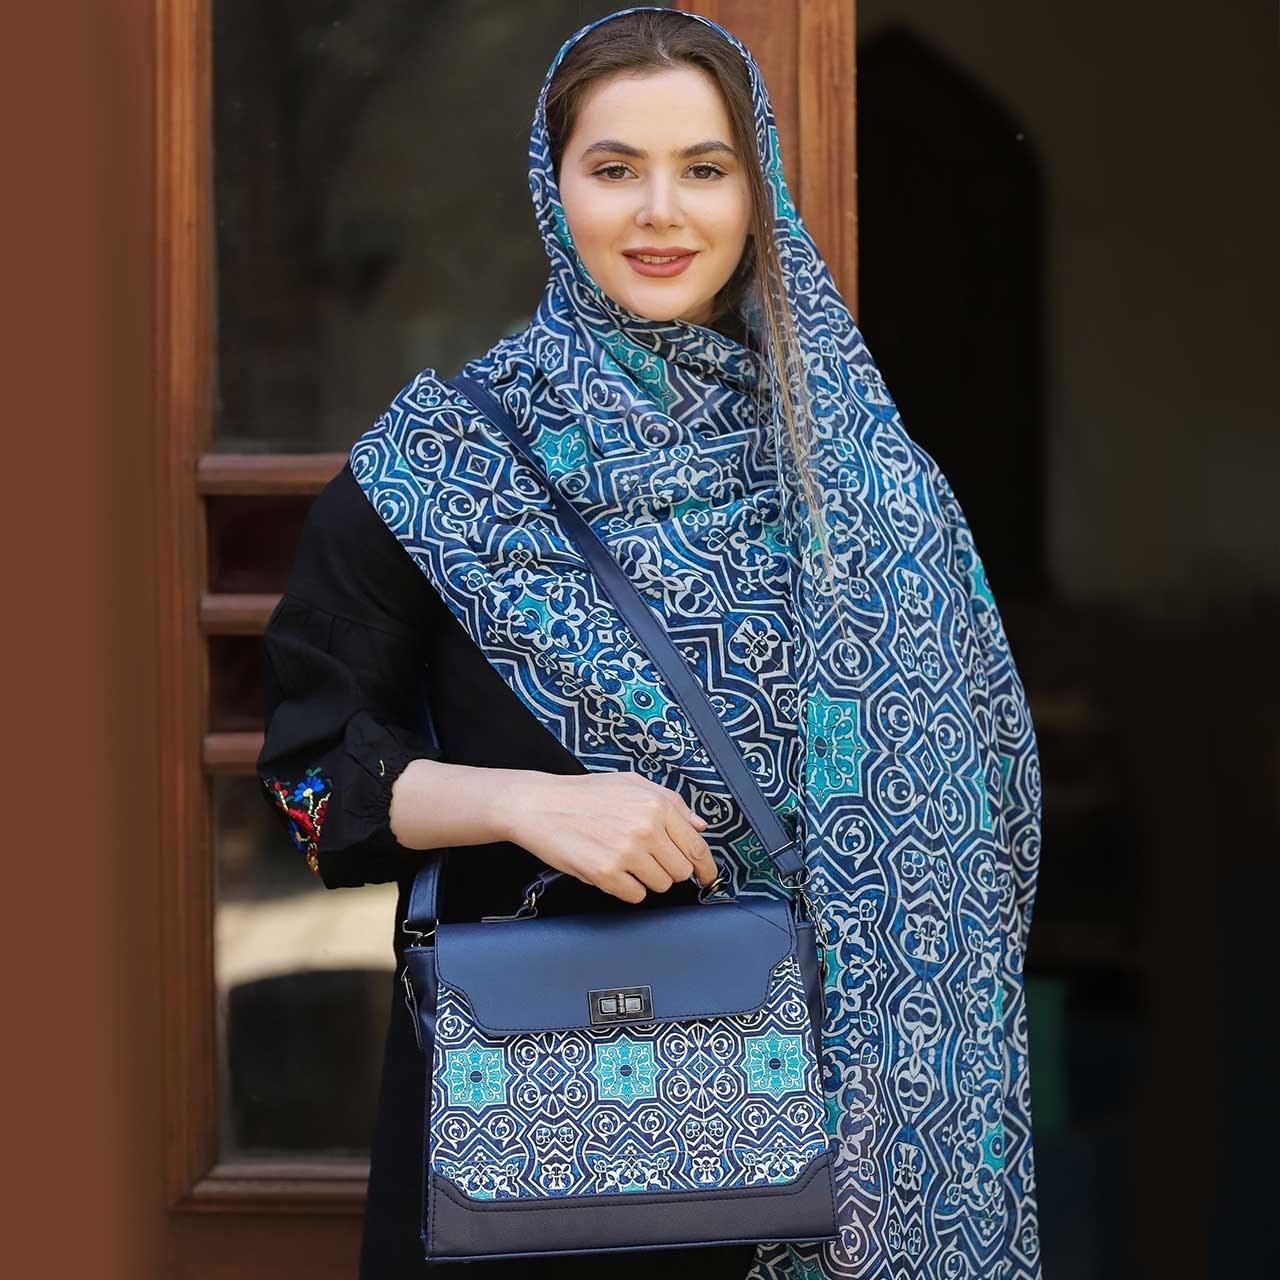 تصویر ست کیف و شال زنانه پیچک کد 01 ا Women  Bag  and  Shawl  Set Code 01 Women  Bag  and  Shawl  Set Code 01